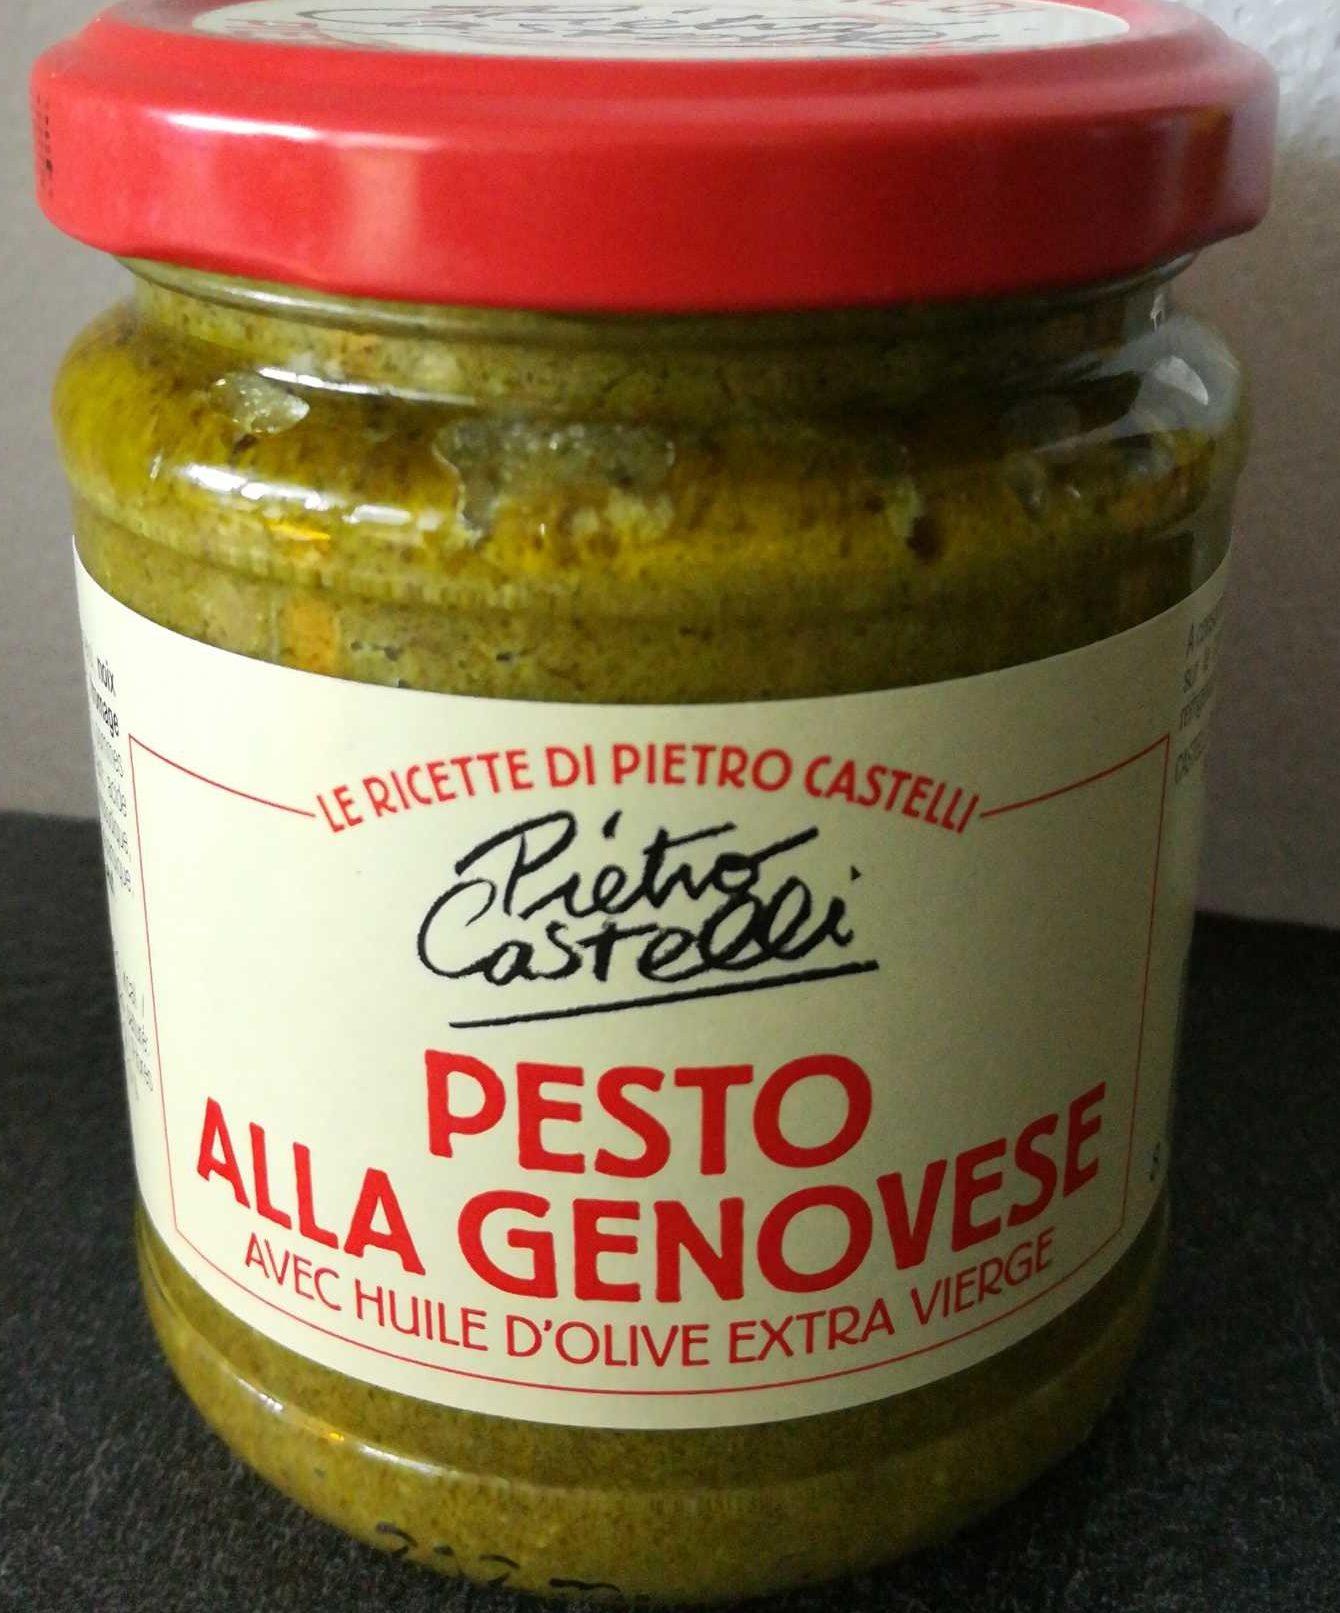 Sauce Pesto Alla Genovese 190 G - CASTELLI - Product - fr